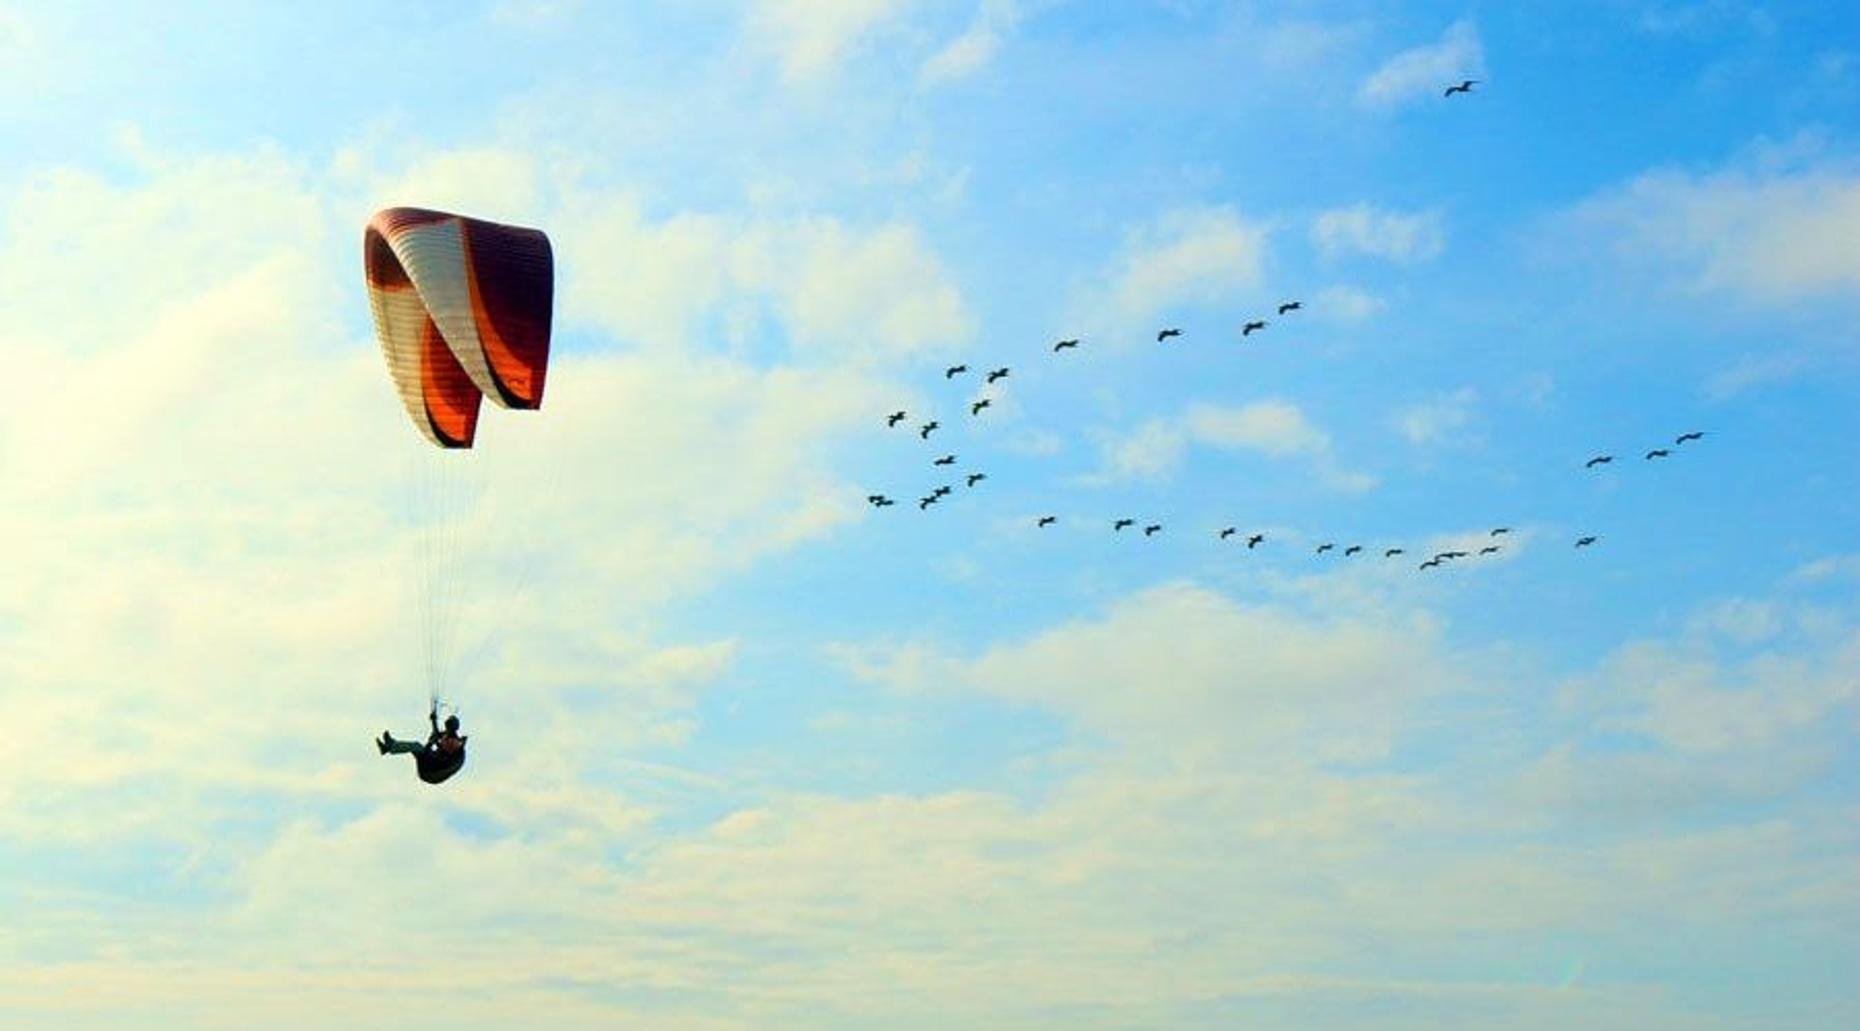 Canoa Paragliding Flight